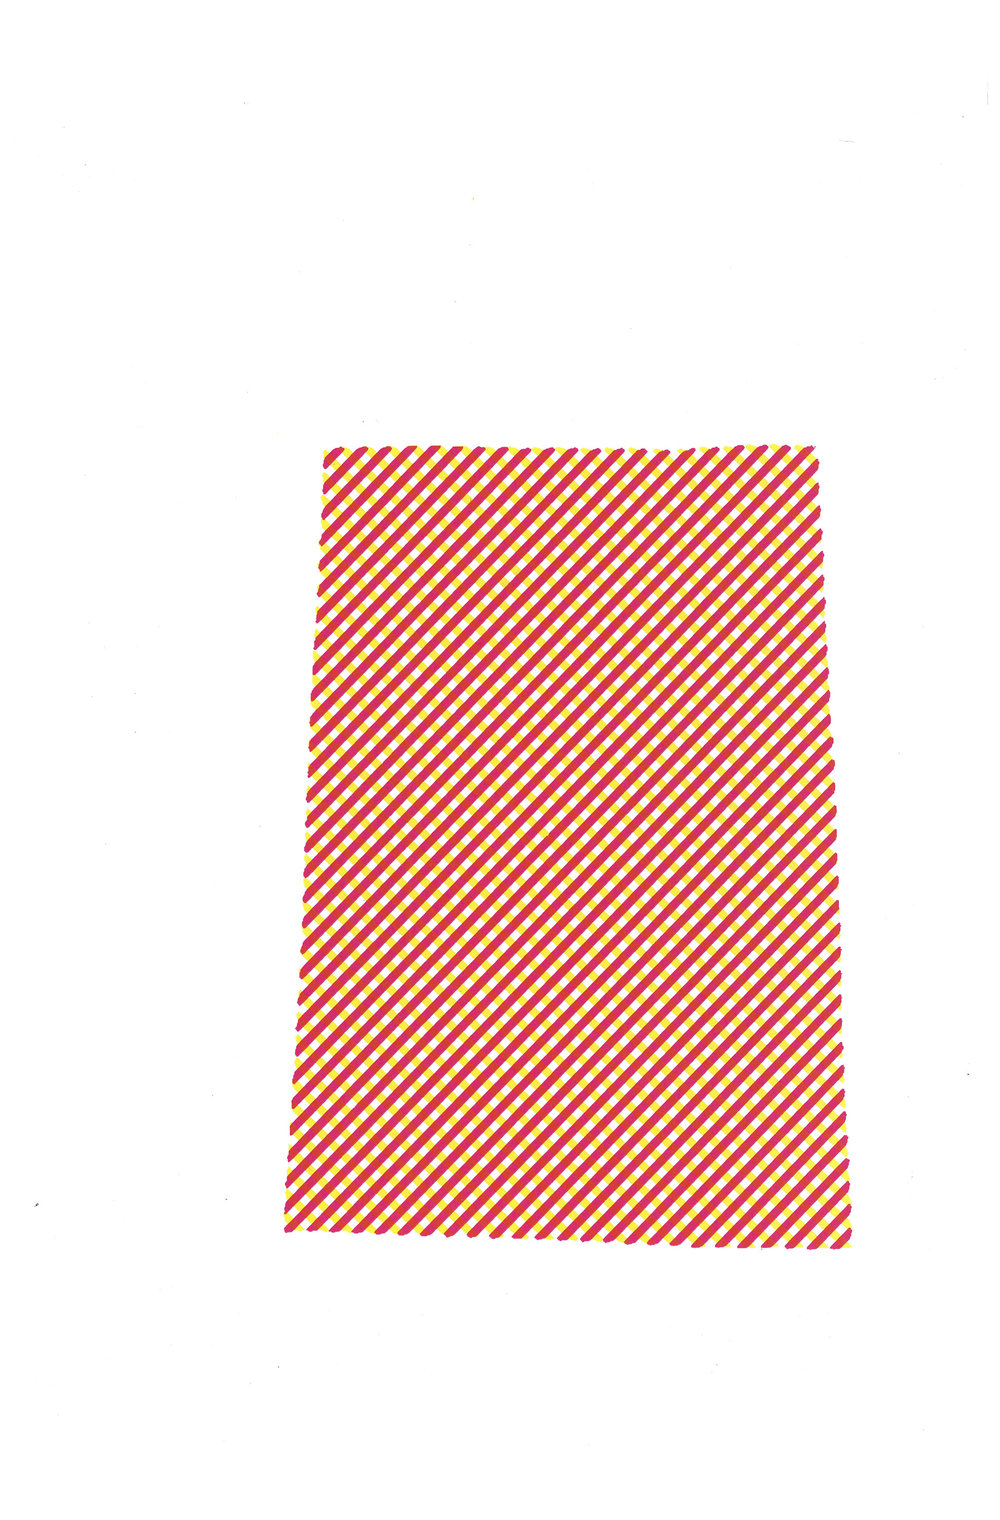 Trapezoid_my_72.jpg